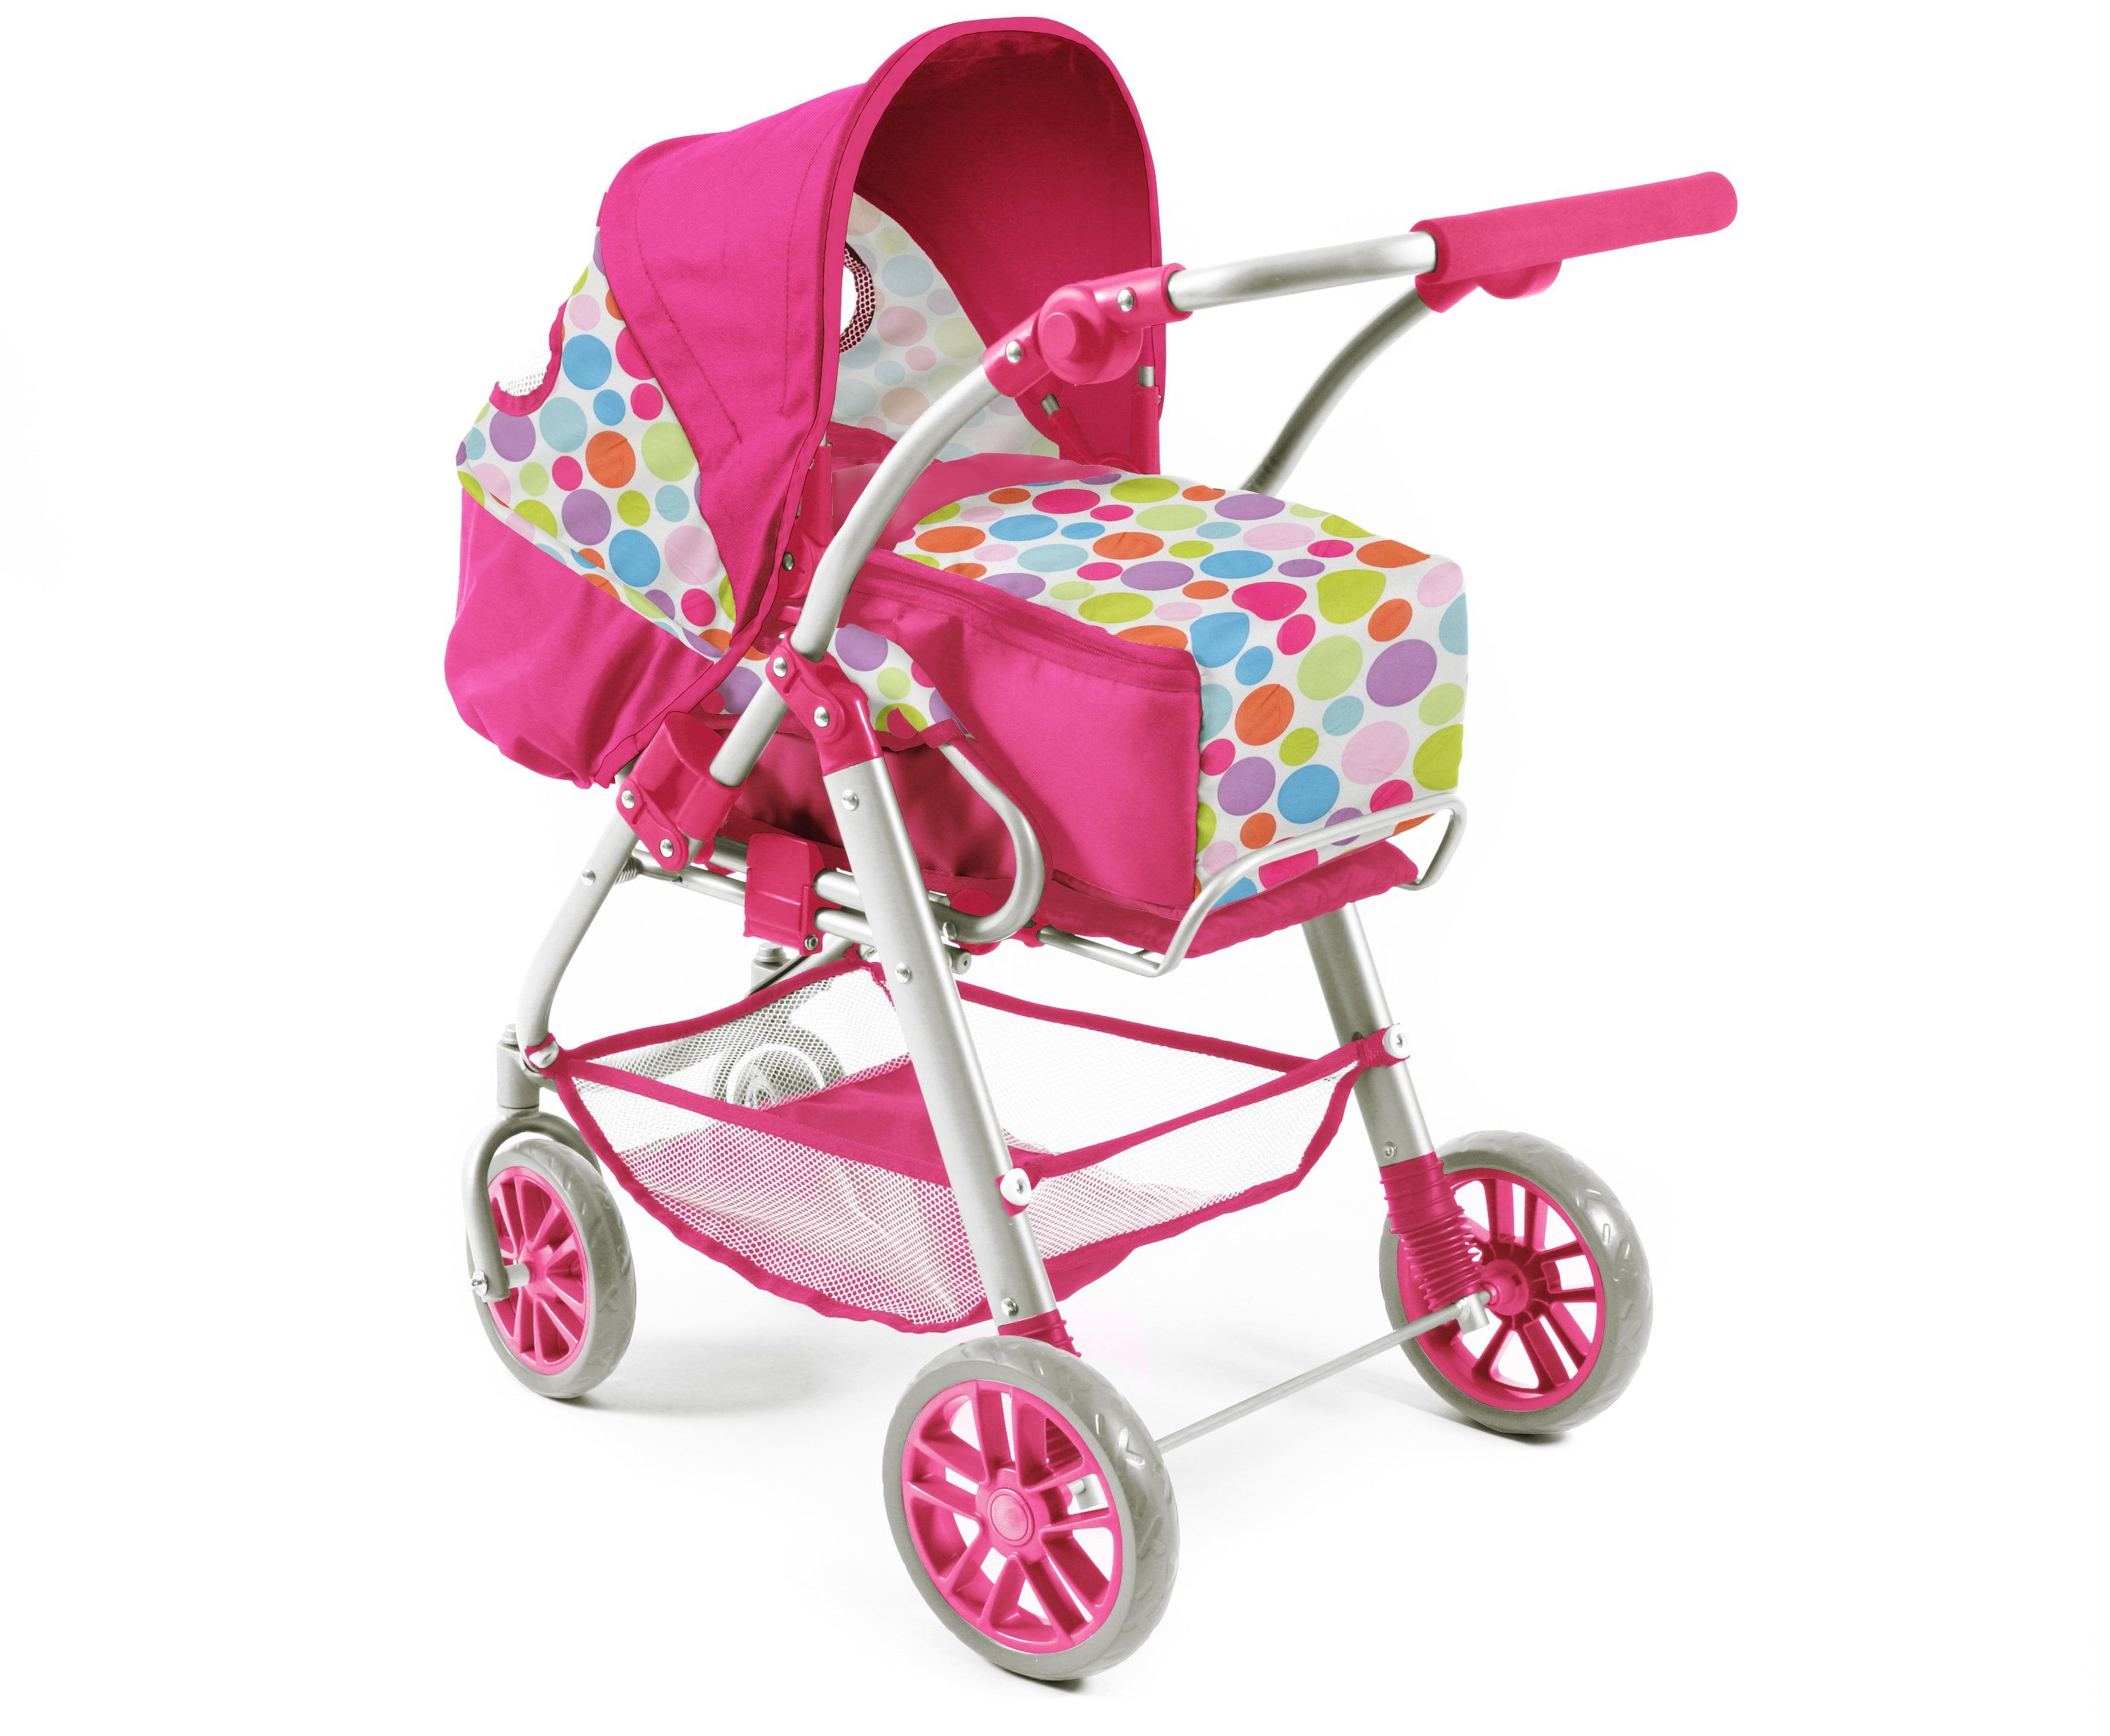 CHIC2000 Kombi Puppenwagen mit herausnehmbarer Tragetasche, »LINO pink«